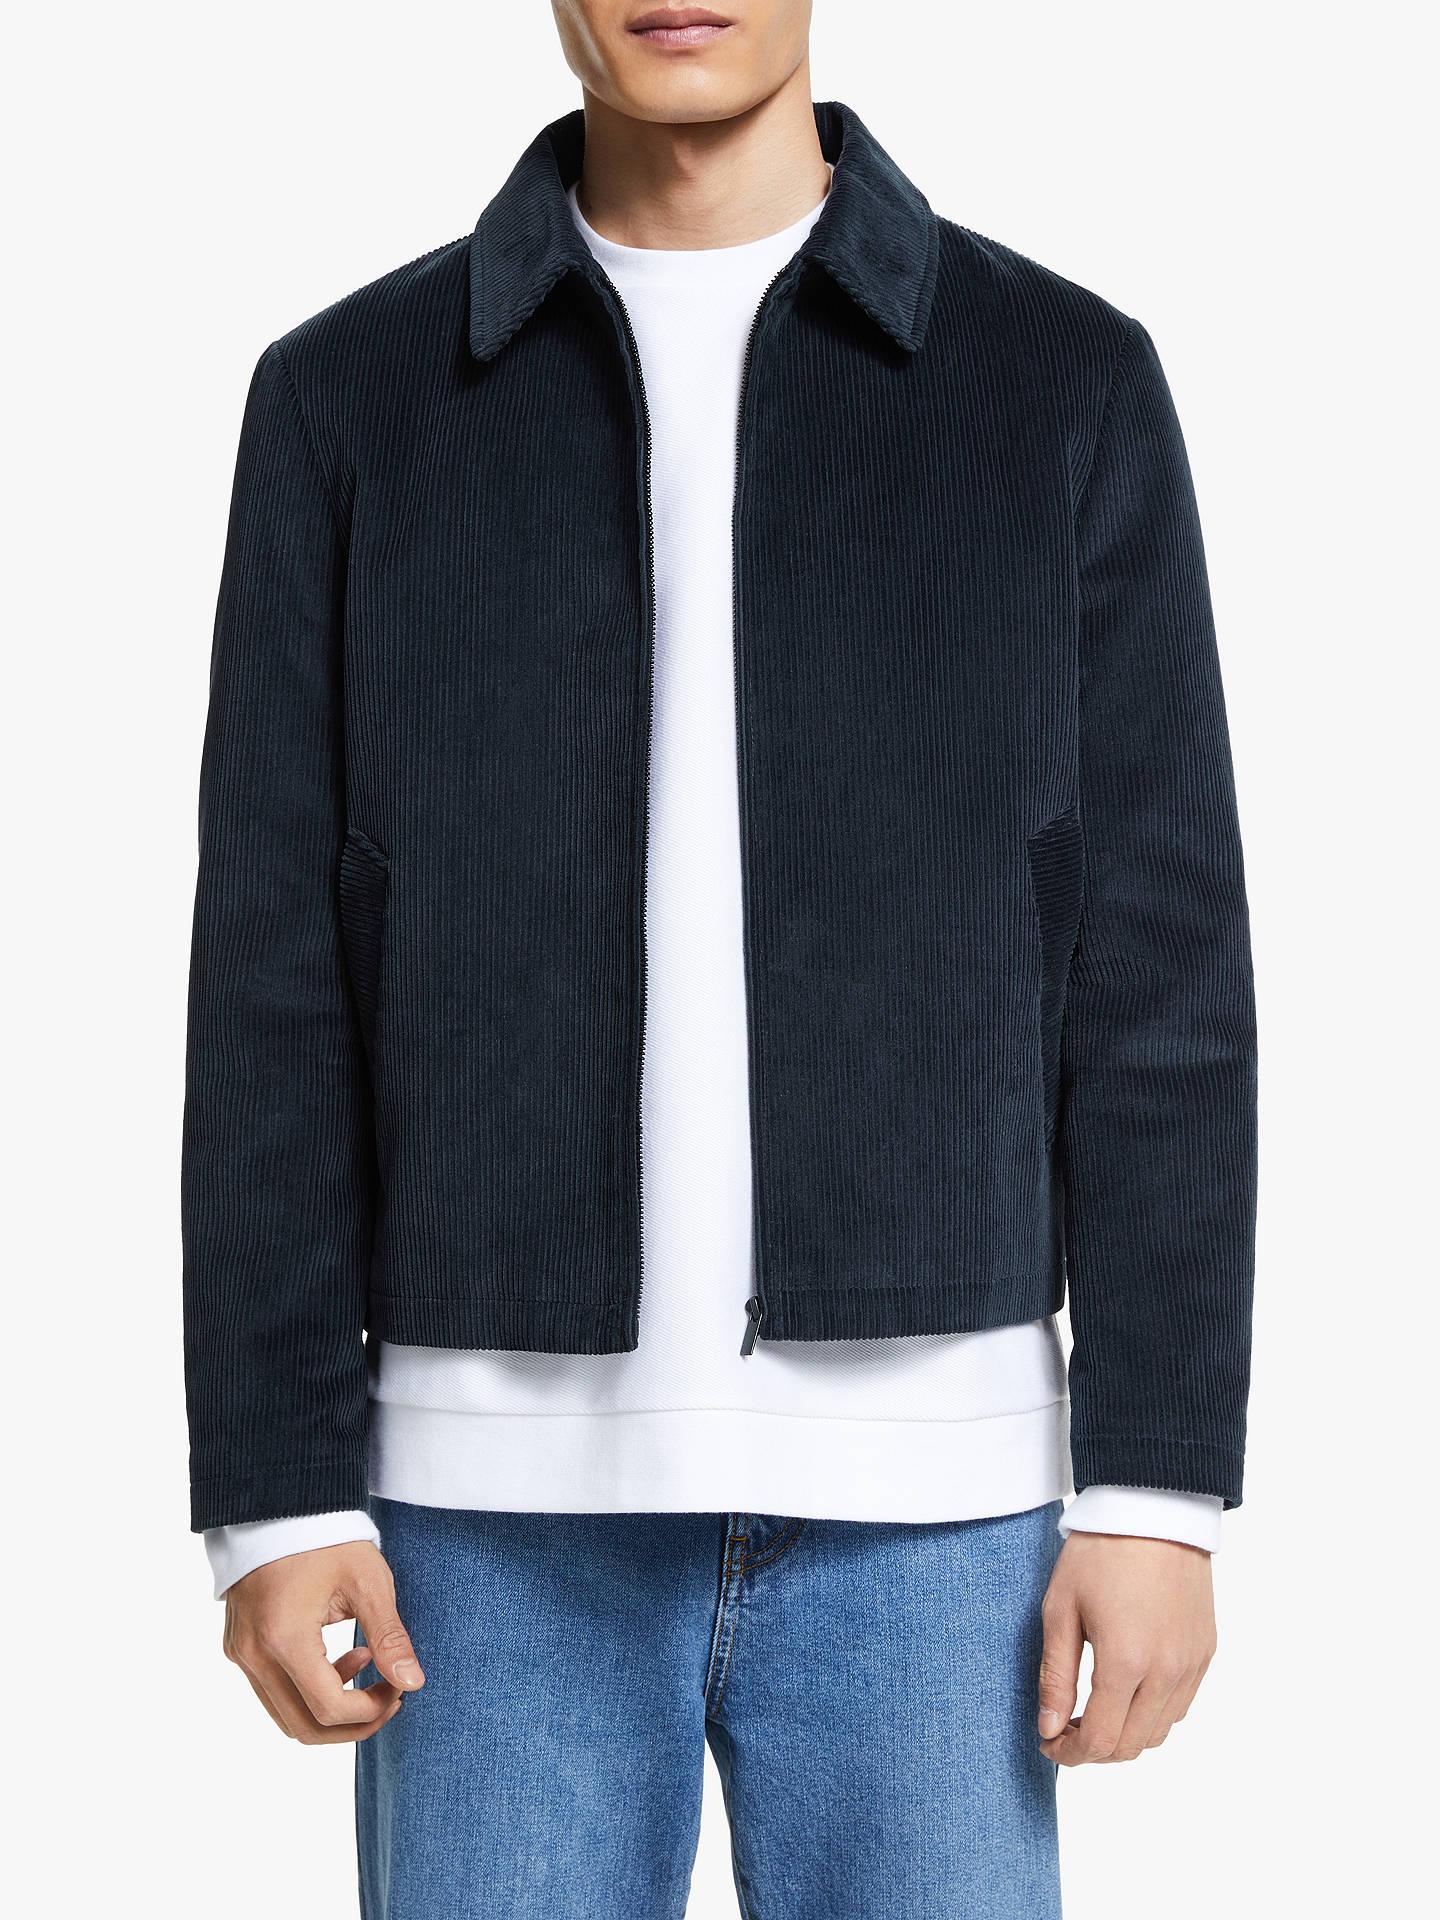 Kin Cotton Corduroy Harrington Jacket, Navy by Kin